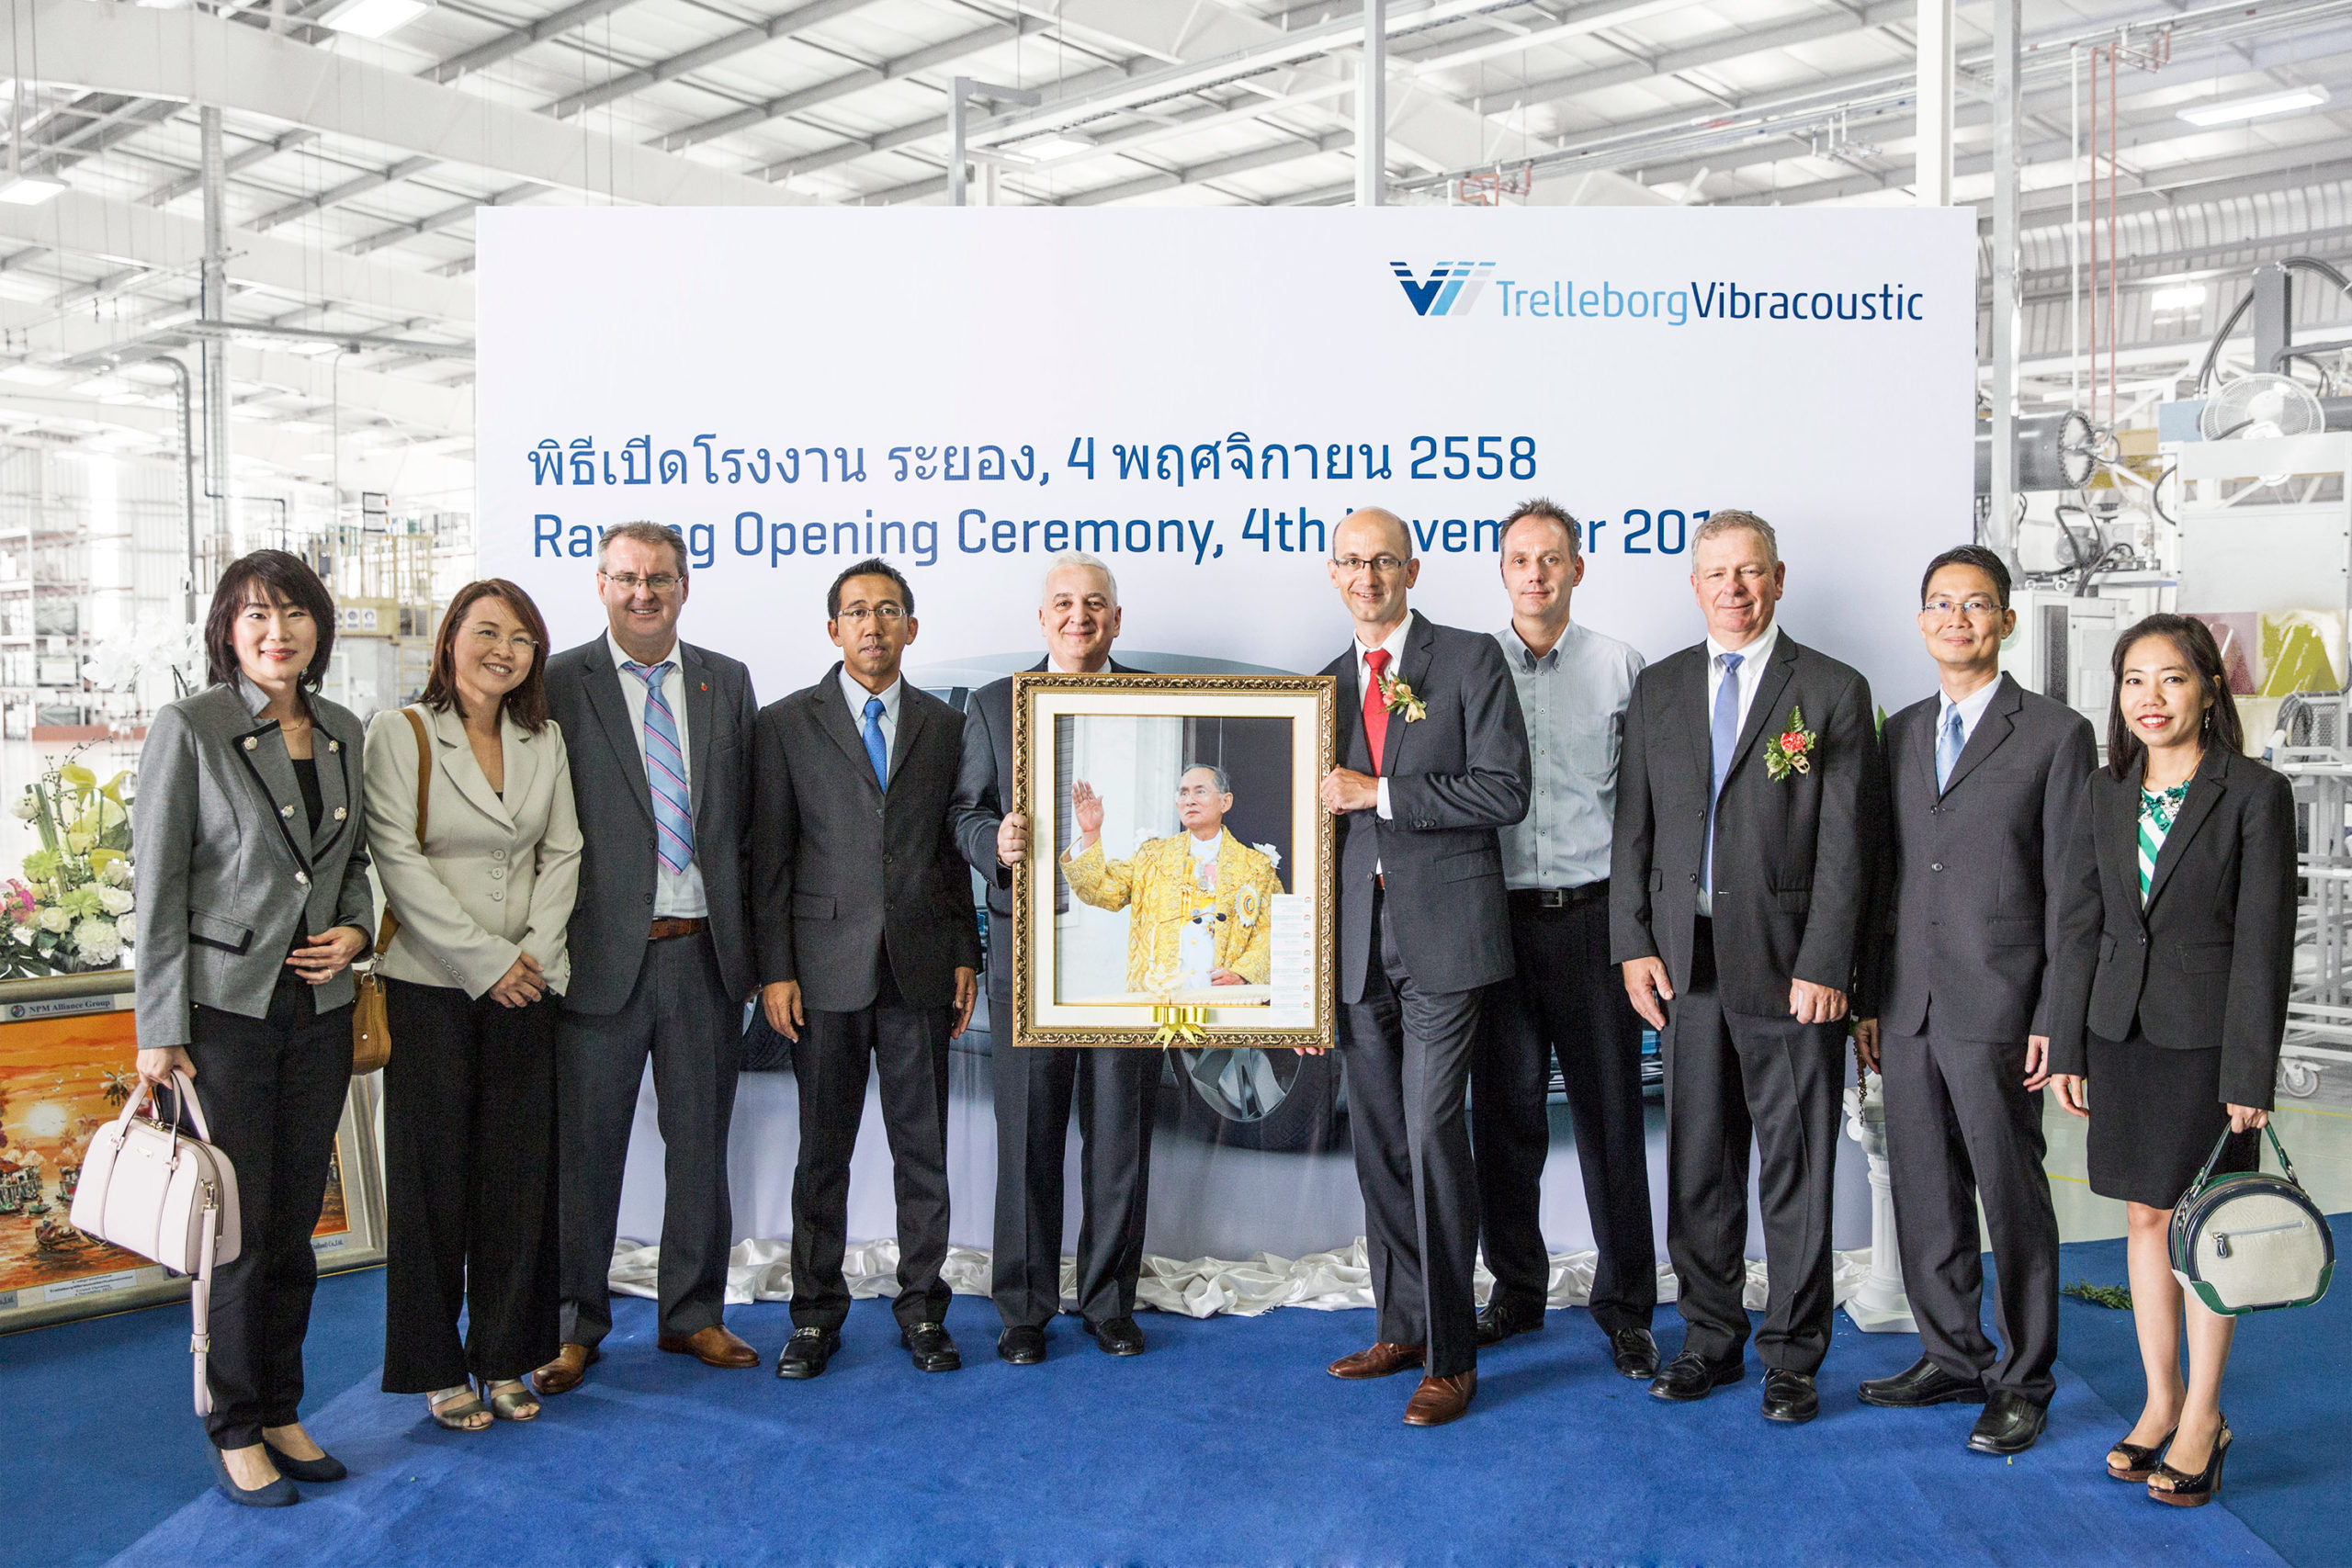 TrelleborgVibracoustic eröffnet Werk in Thailand